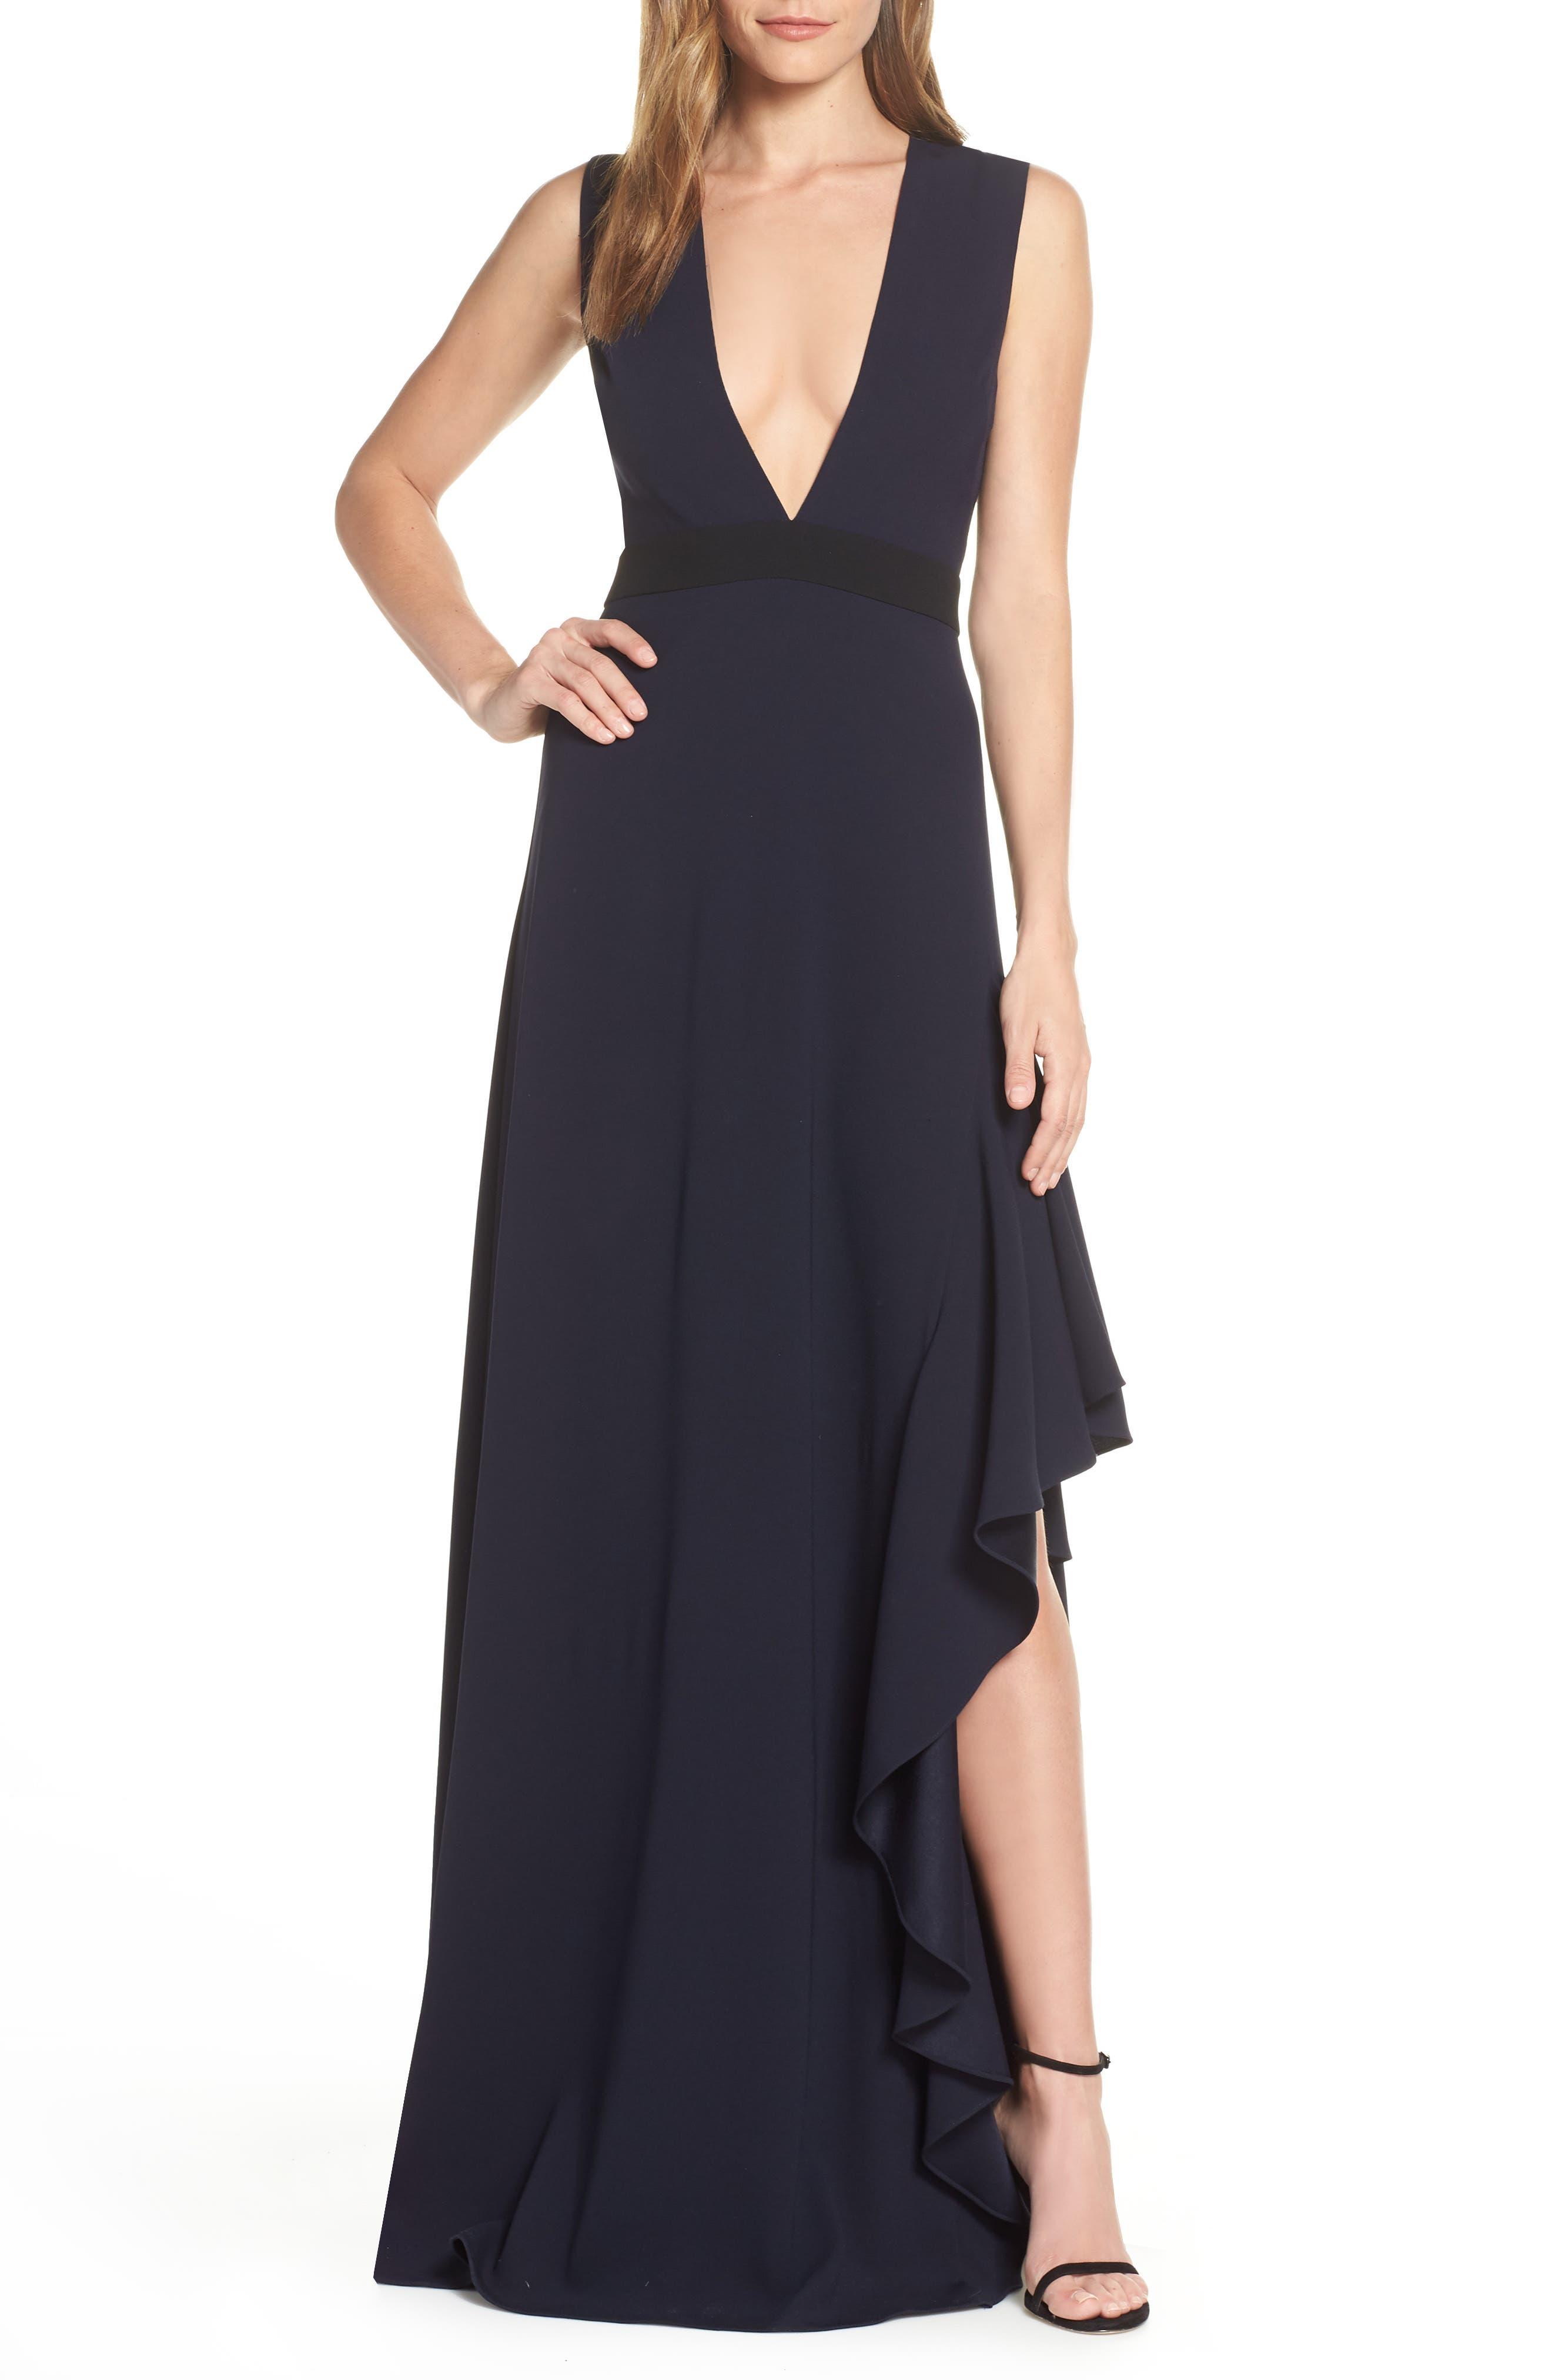 Ml Monique Lhullier Sleeveless Crepe Gown, Blue